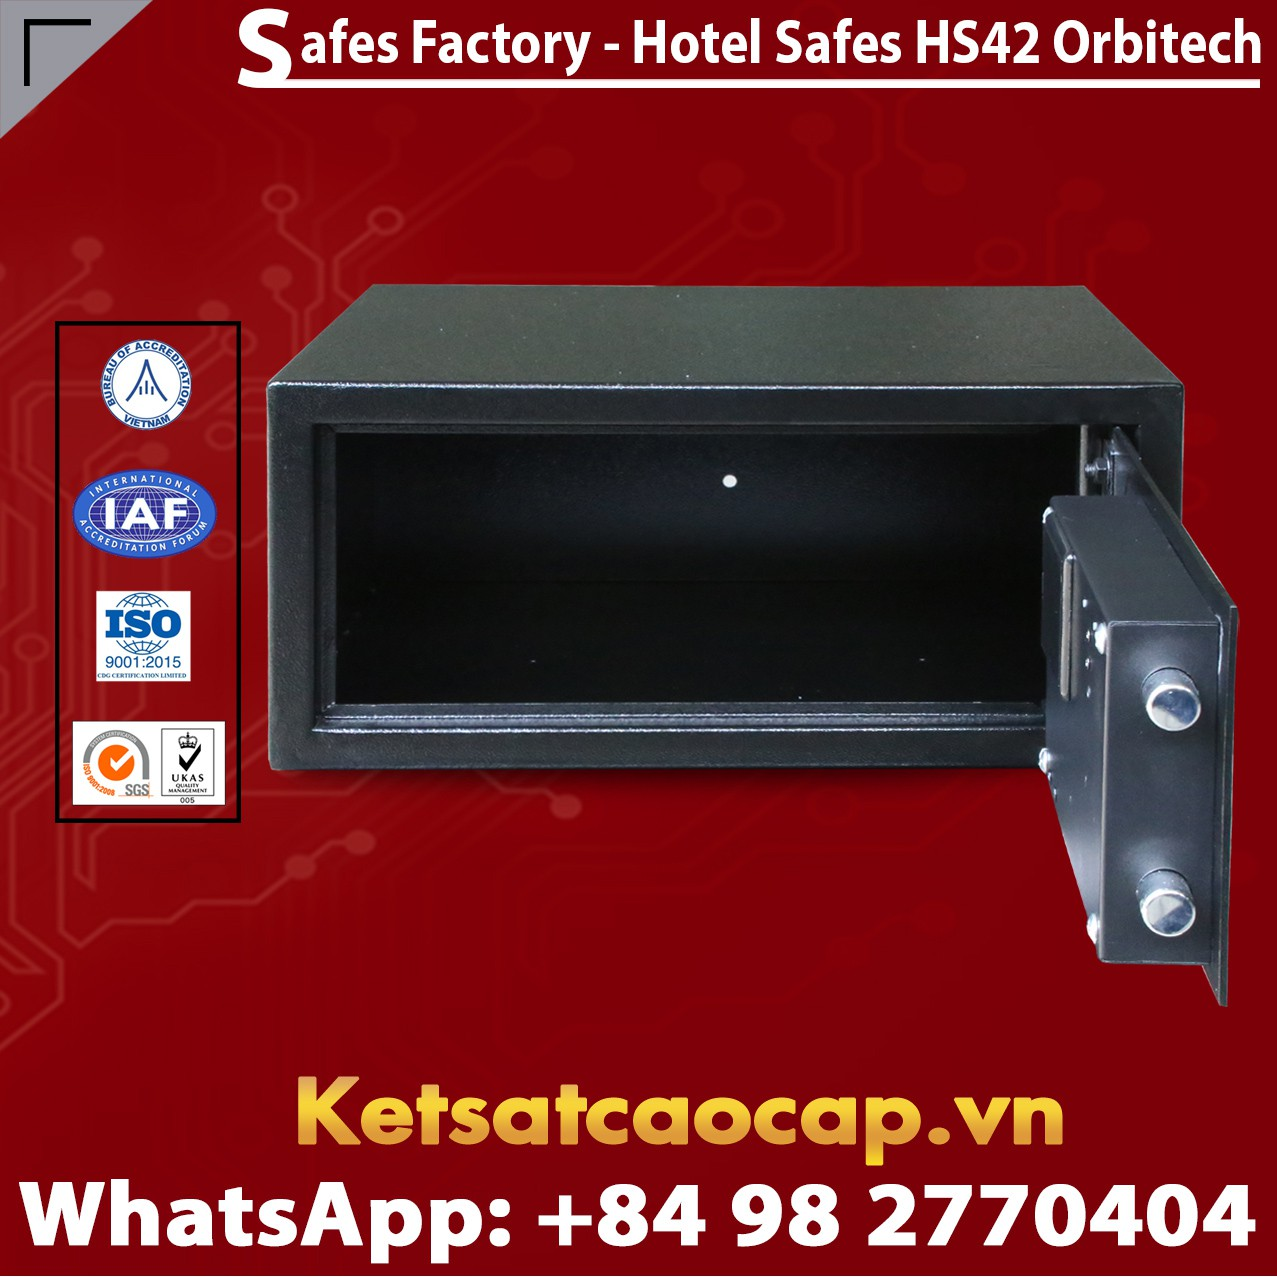 Hotel Safes WELKO HS42 Orbitech